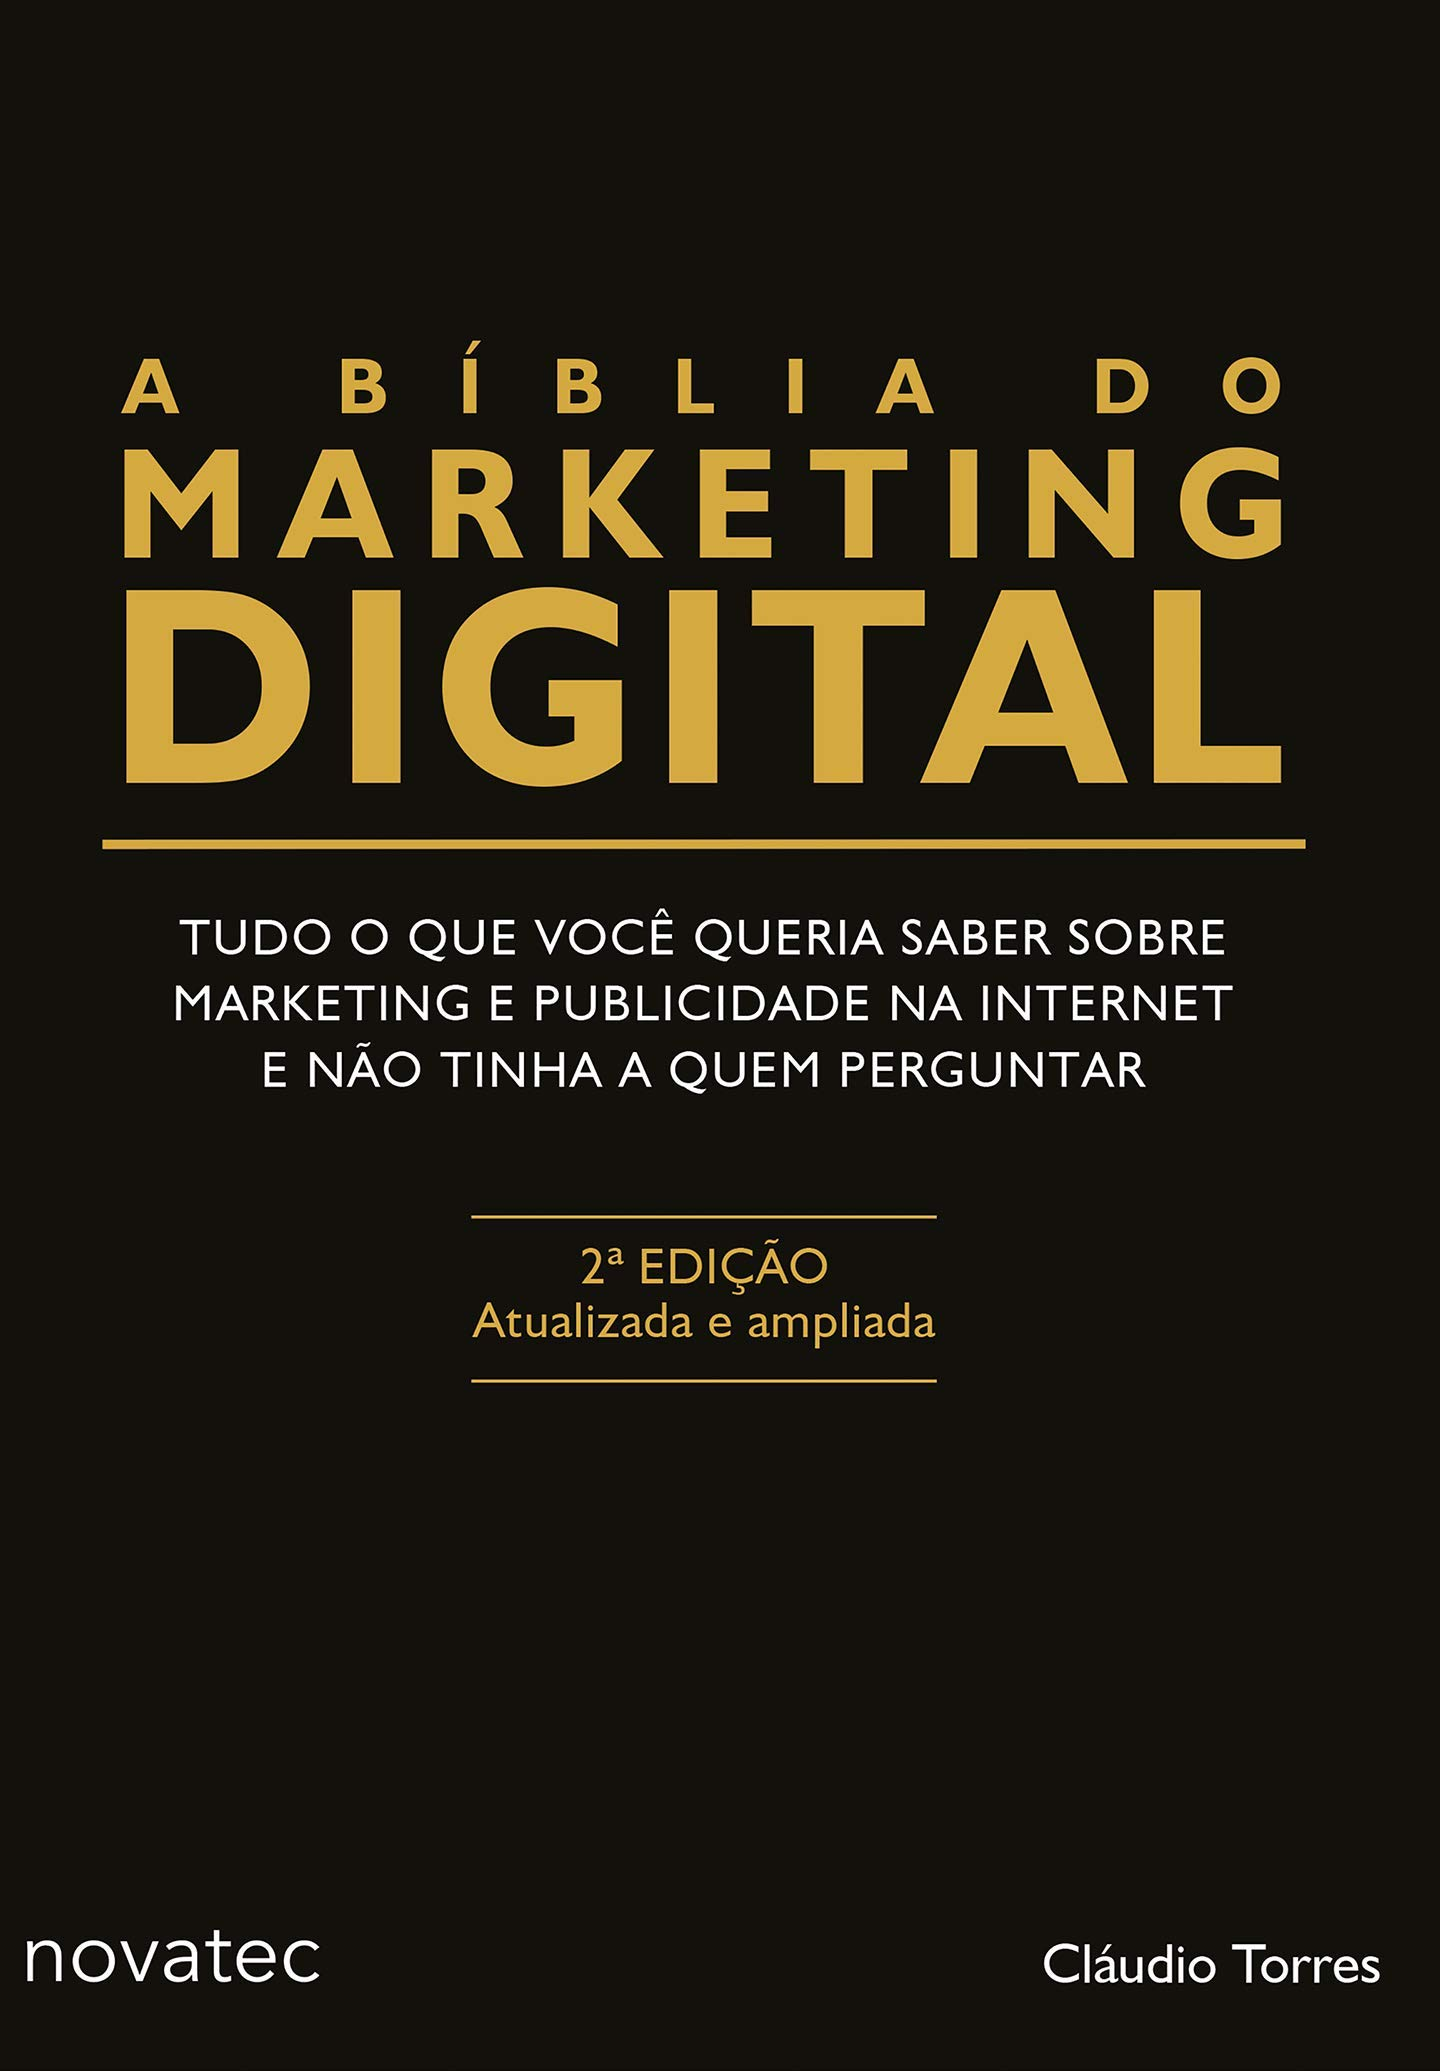 bliblia do marketing digital - marfin